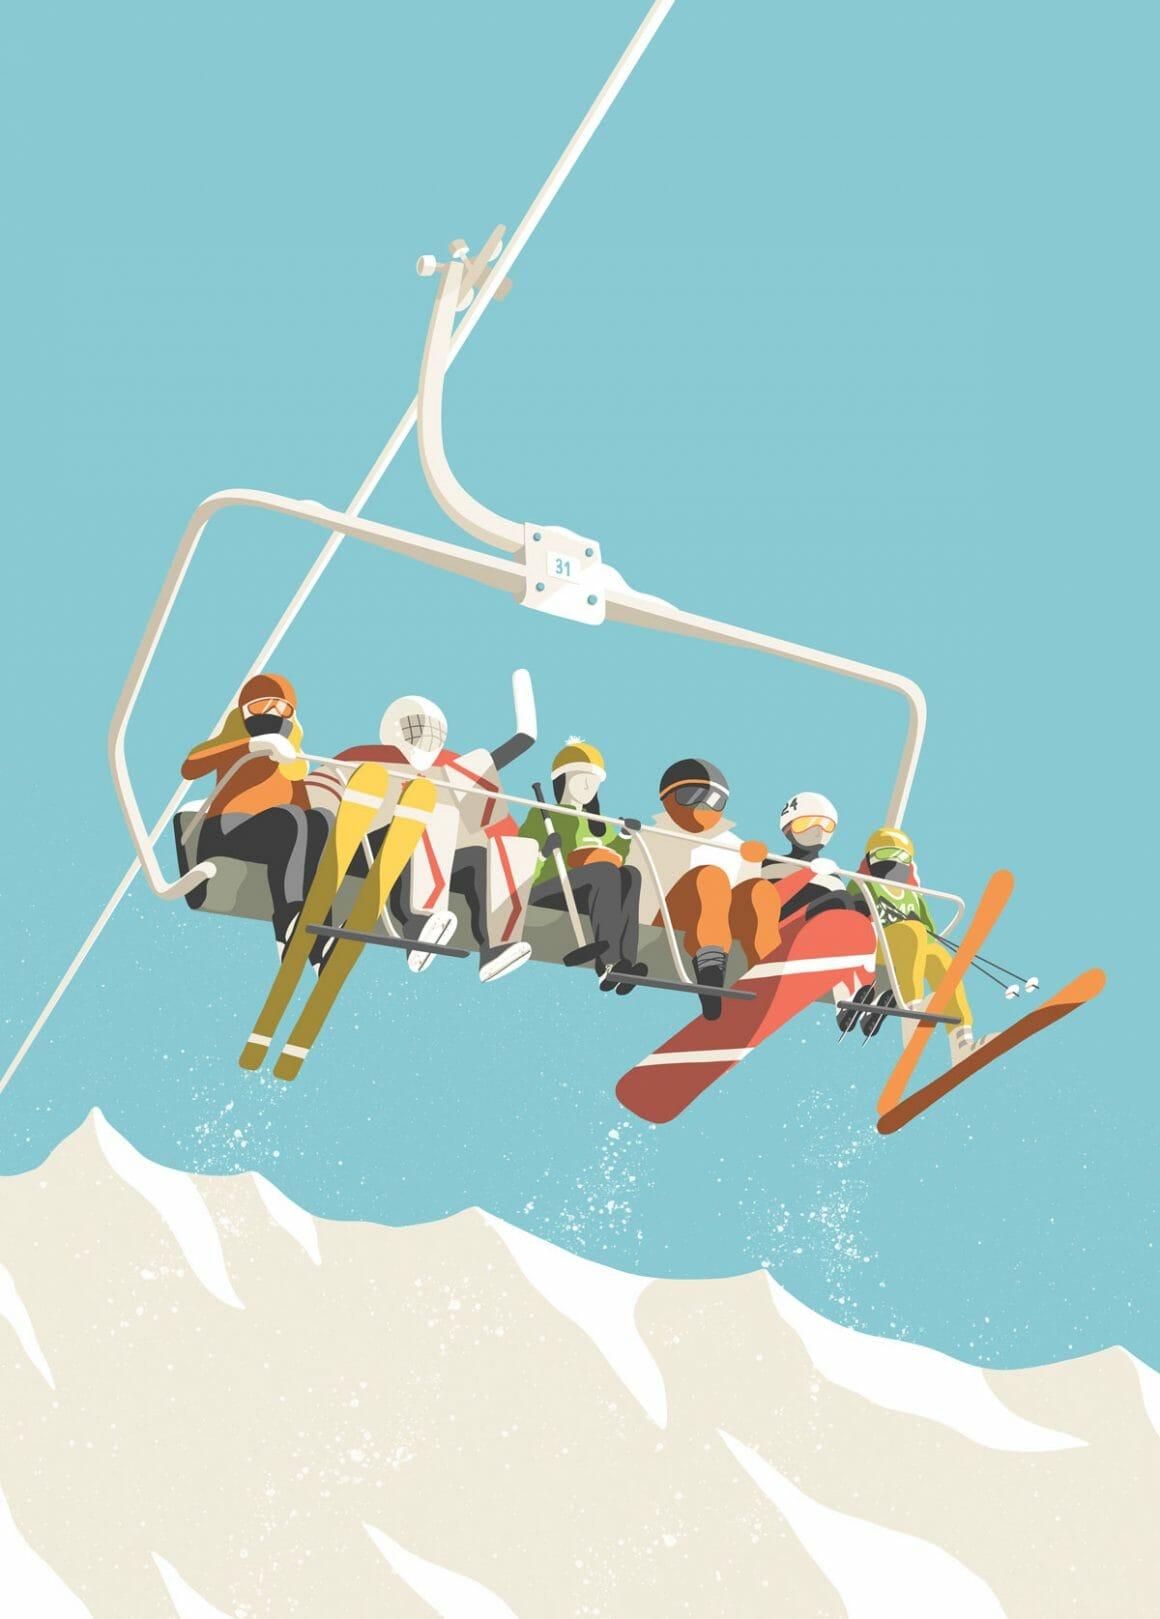 Illustration d'un télésiège par Kristen Boydstun